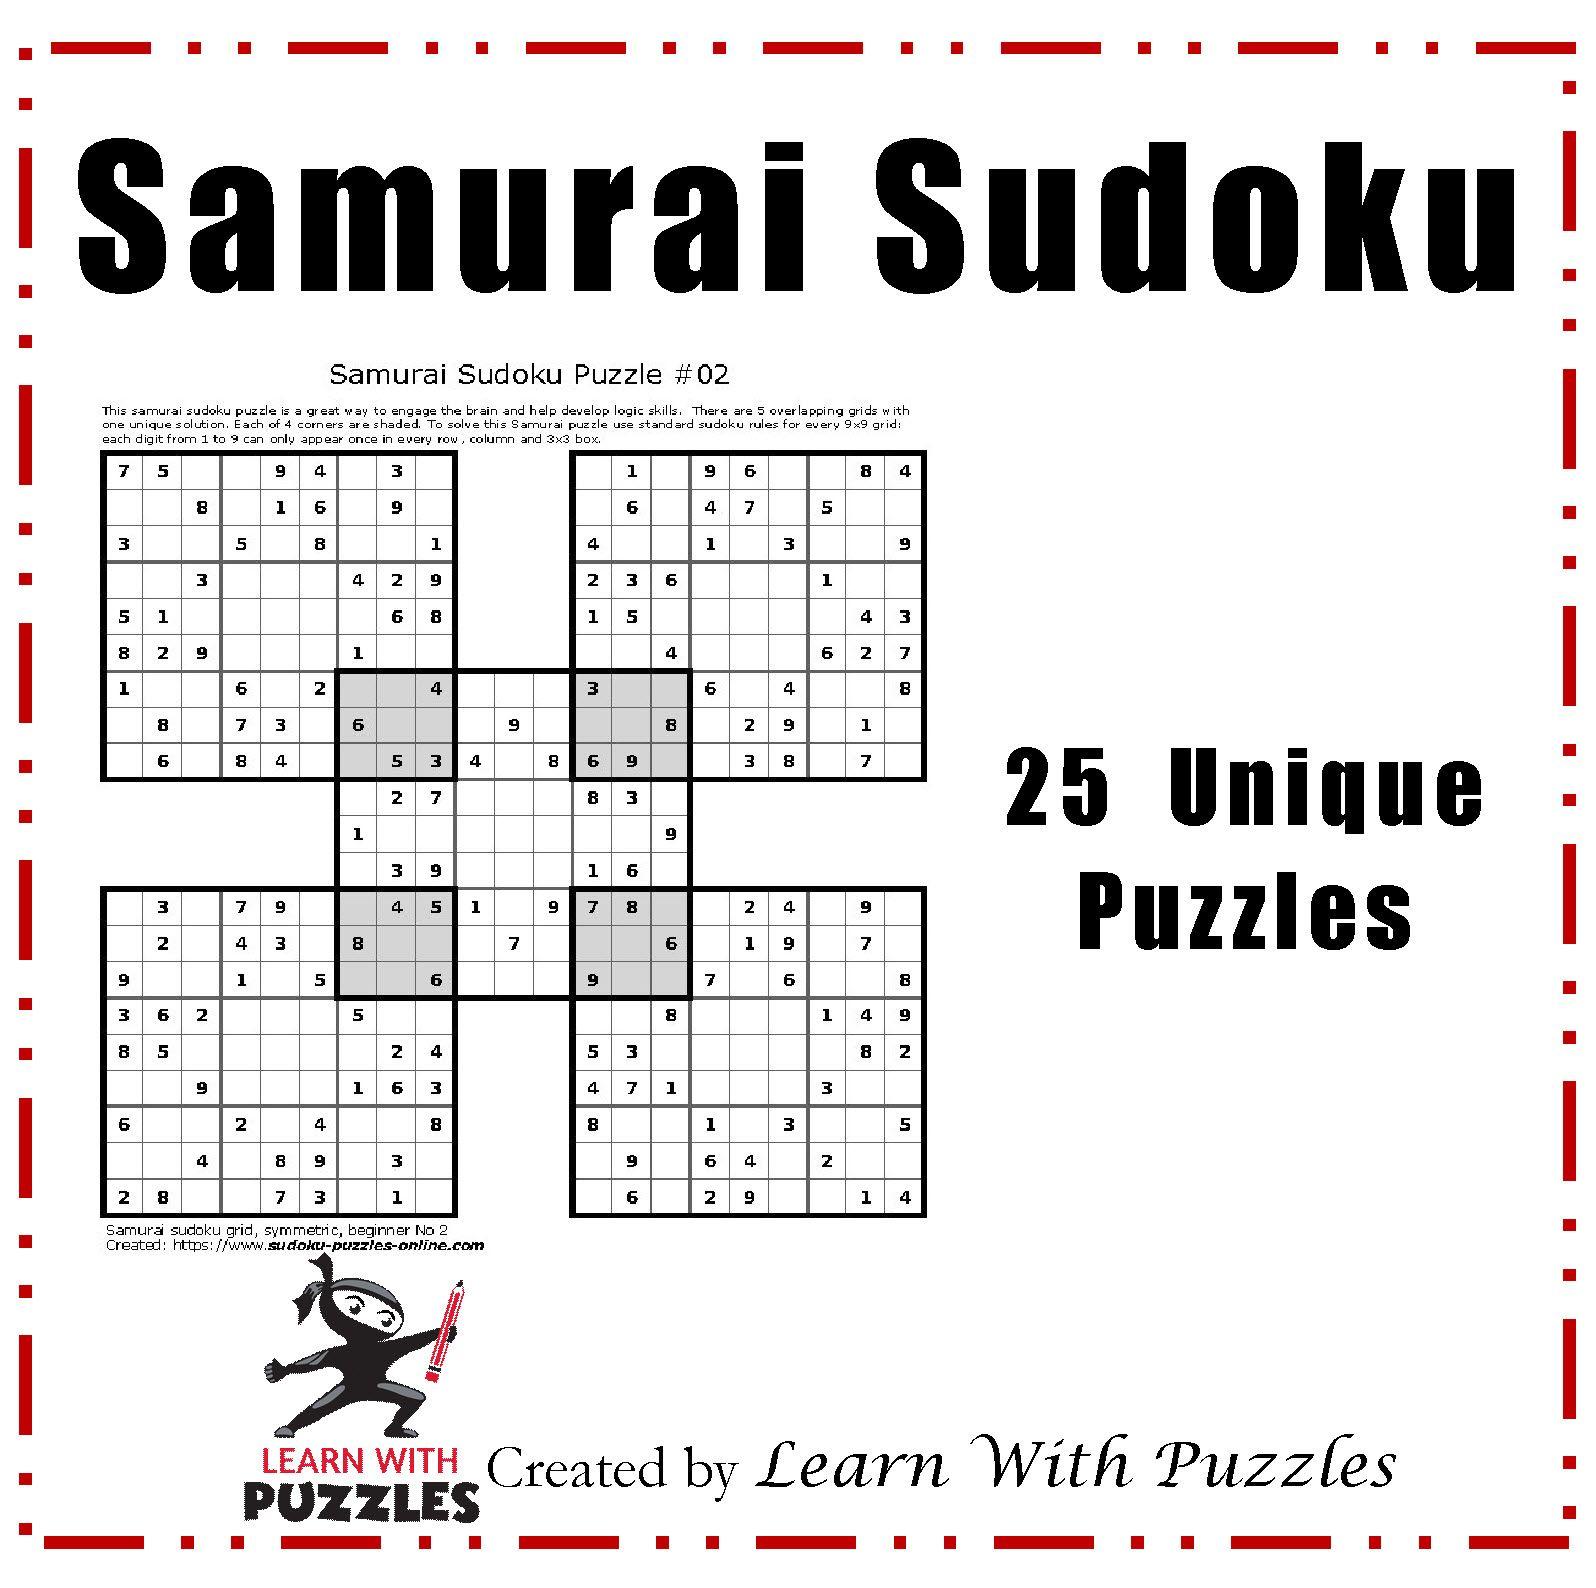 Samurai Sudoku Puzzles - 25 Unique Sudoku Puzzle Collection